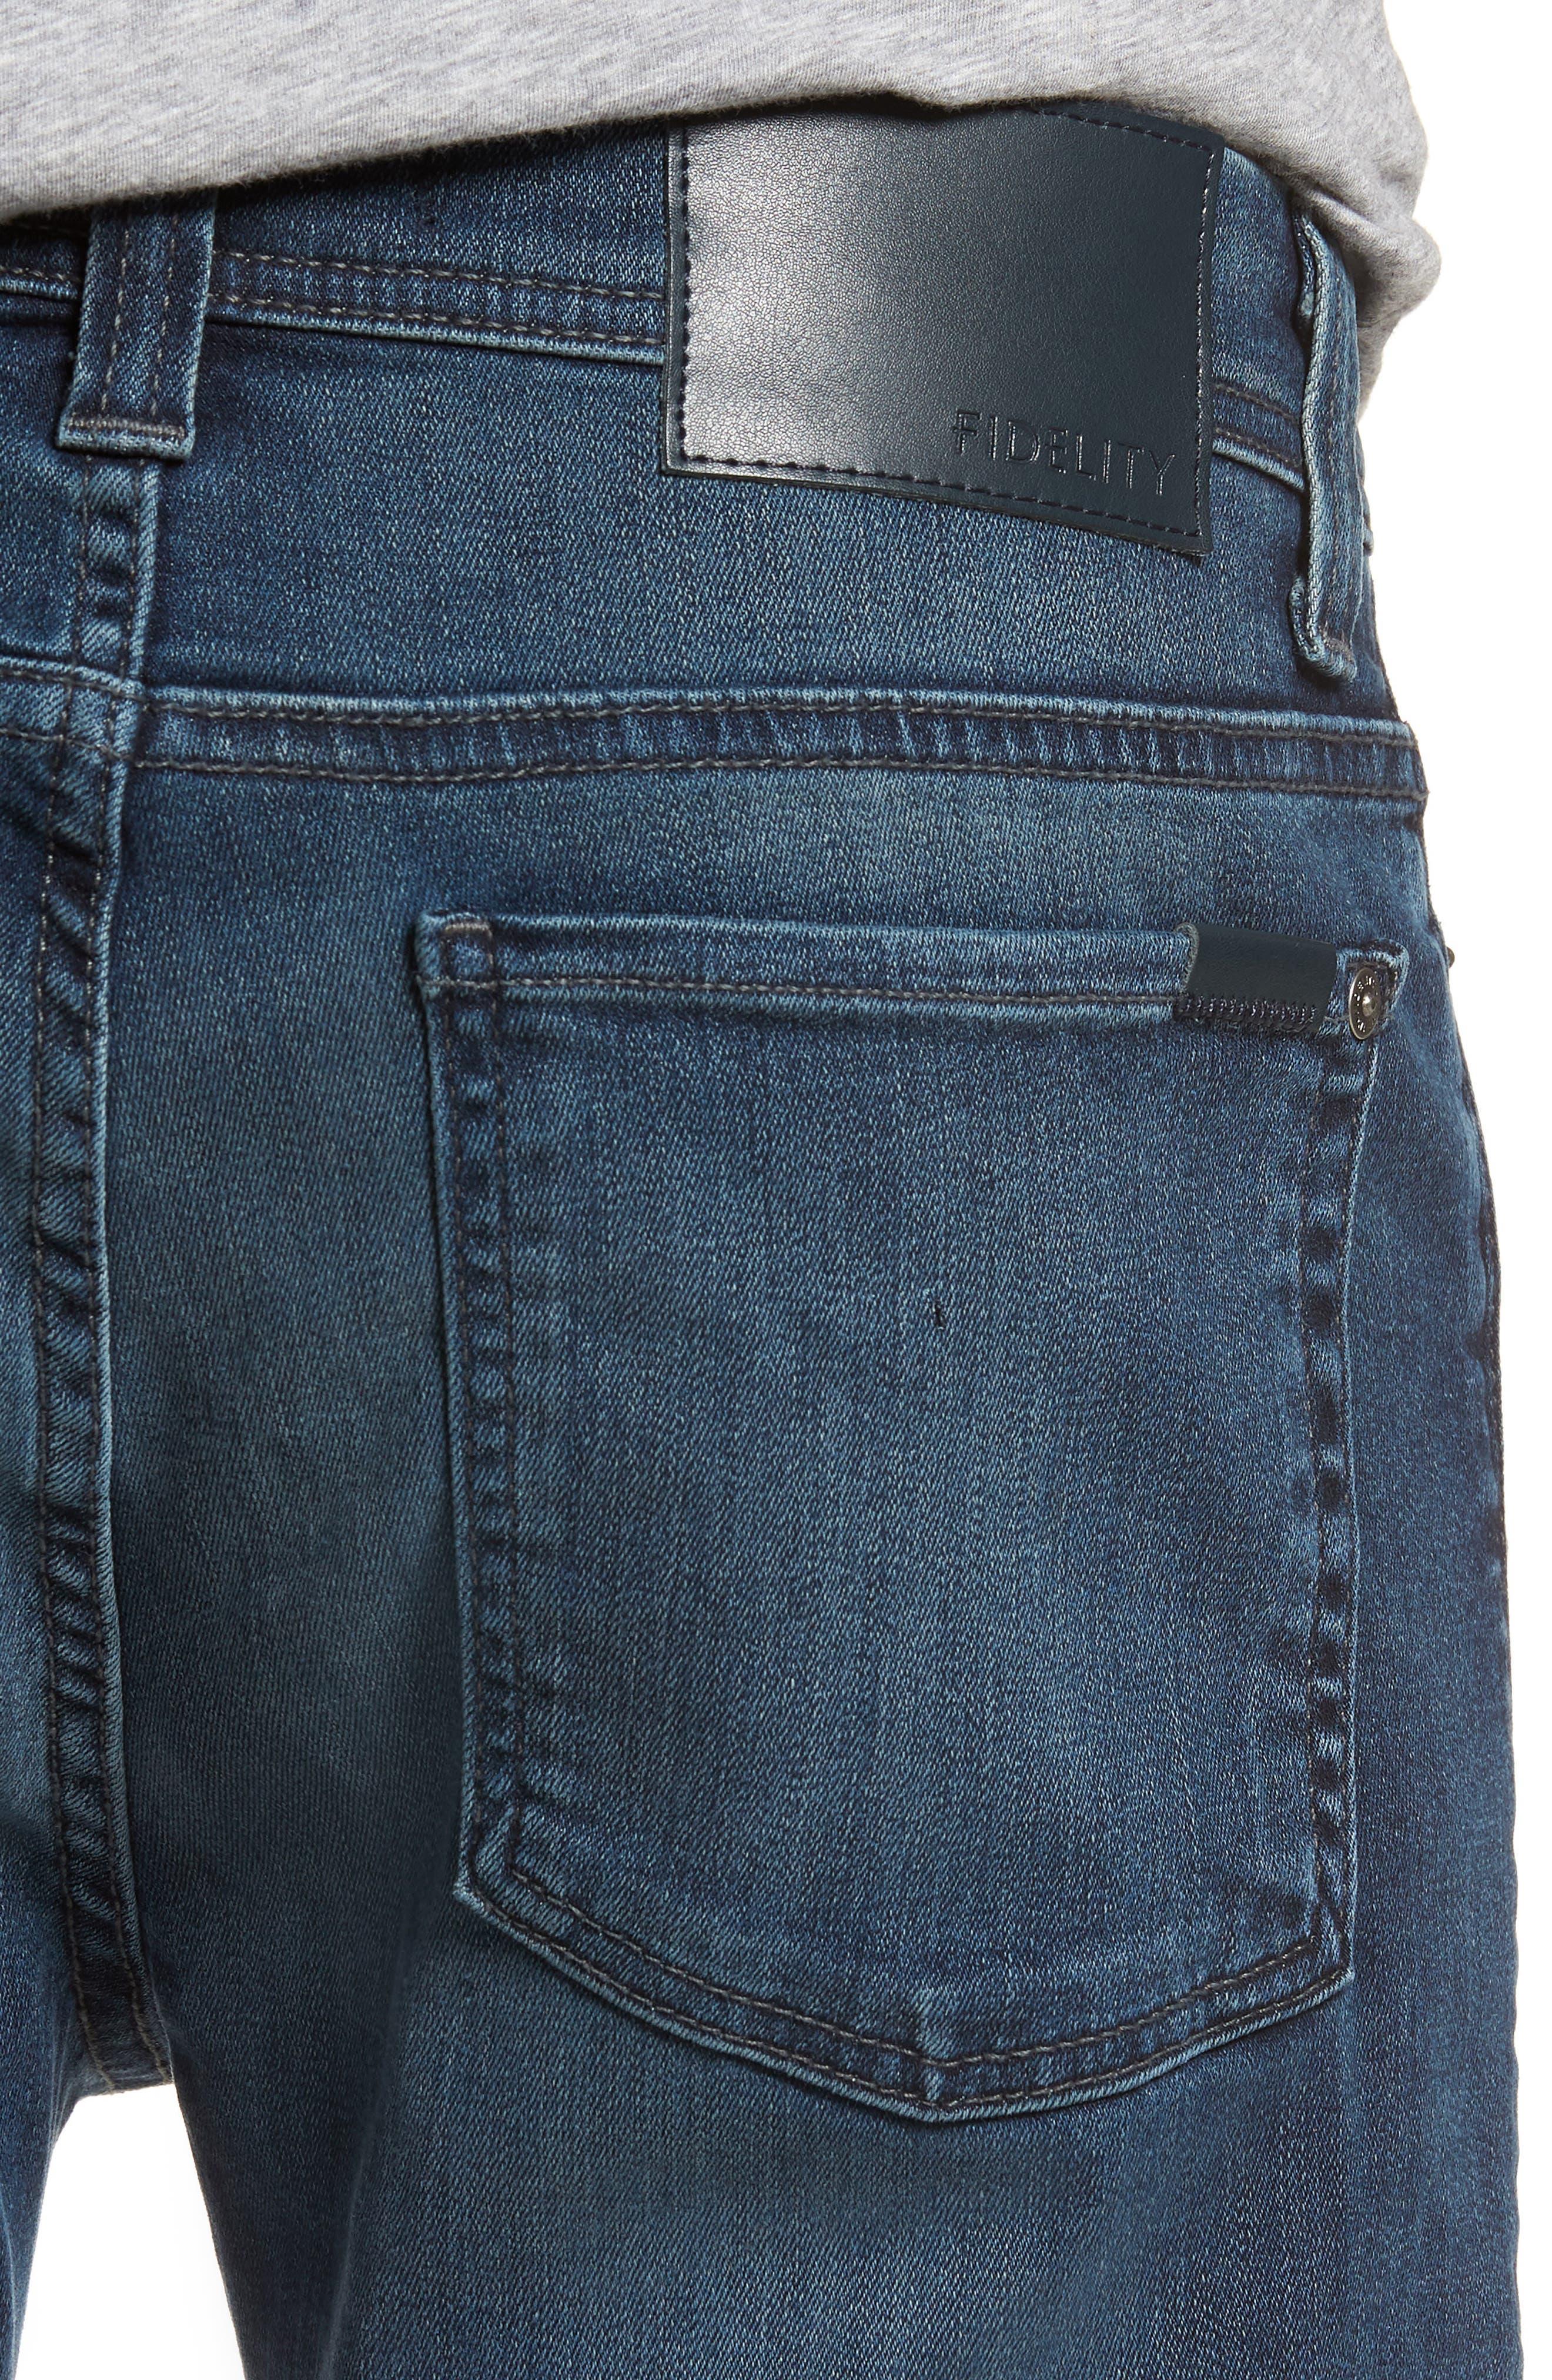 Jimmy Slim Straight Leg Jeans,                             Alternate thumbnail 4, color,                             Atlas Blue